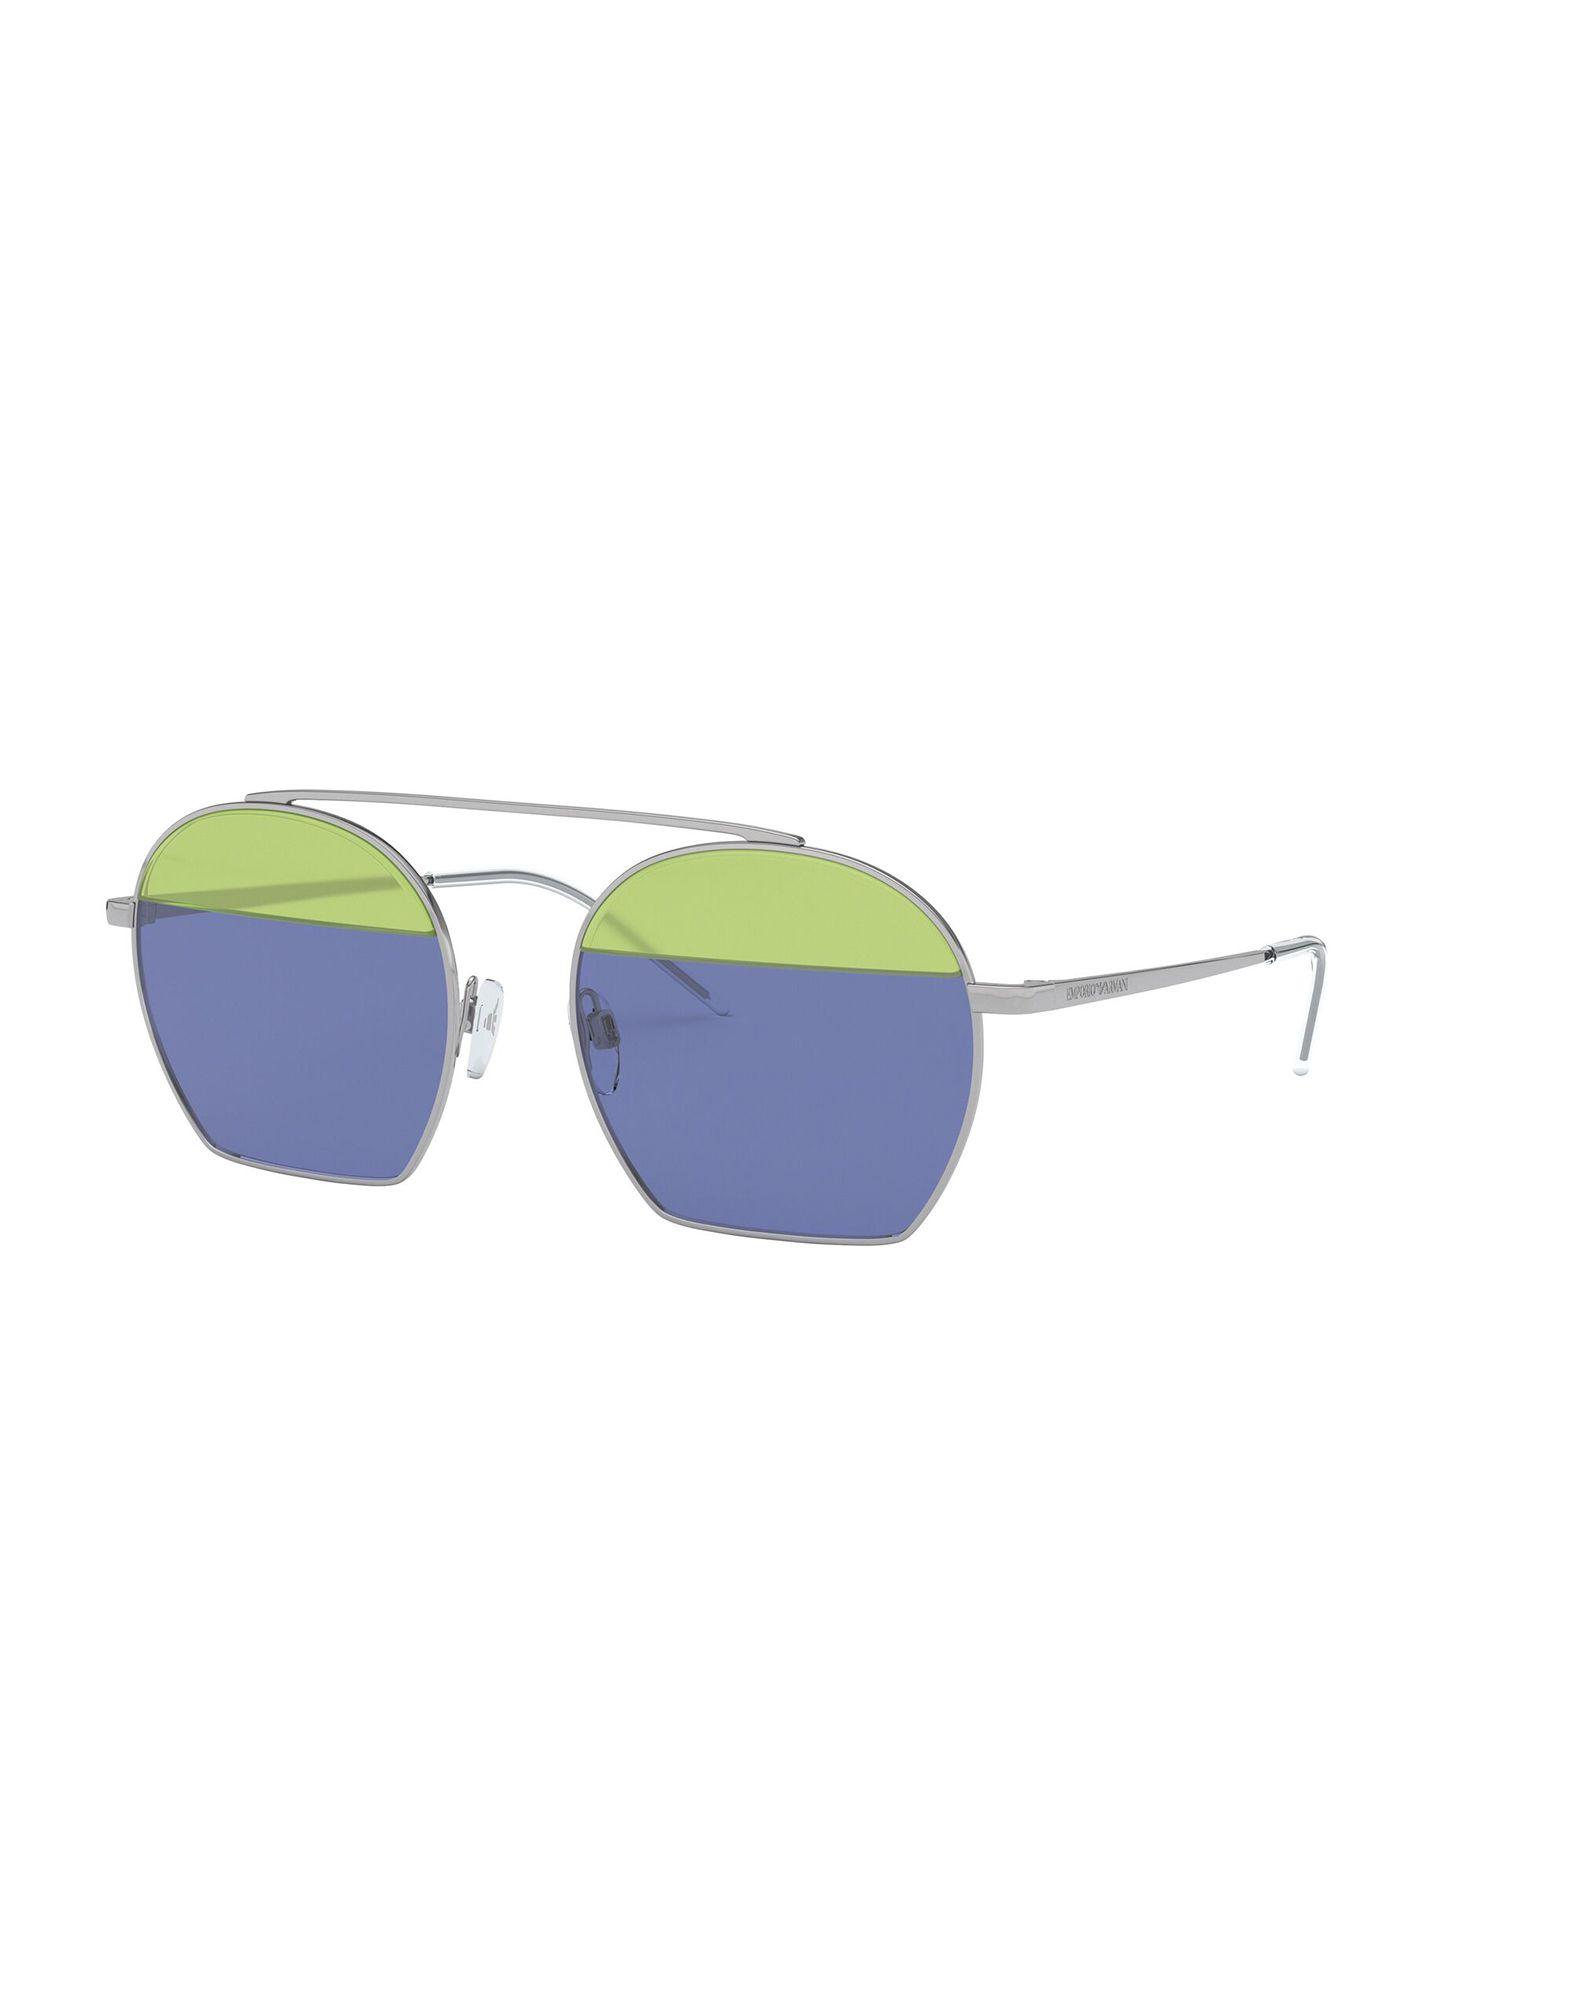 Фото - EMPORIO ARMANI Солнечные очки 3d очки